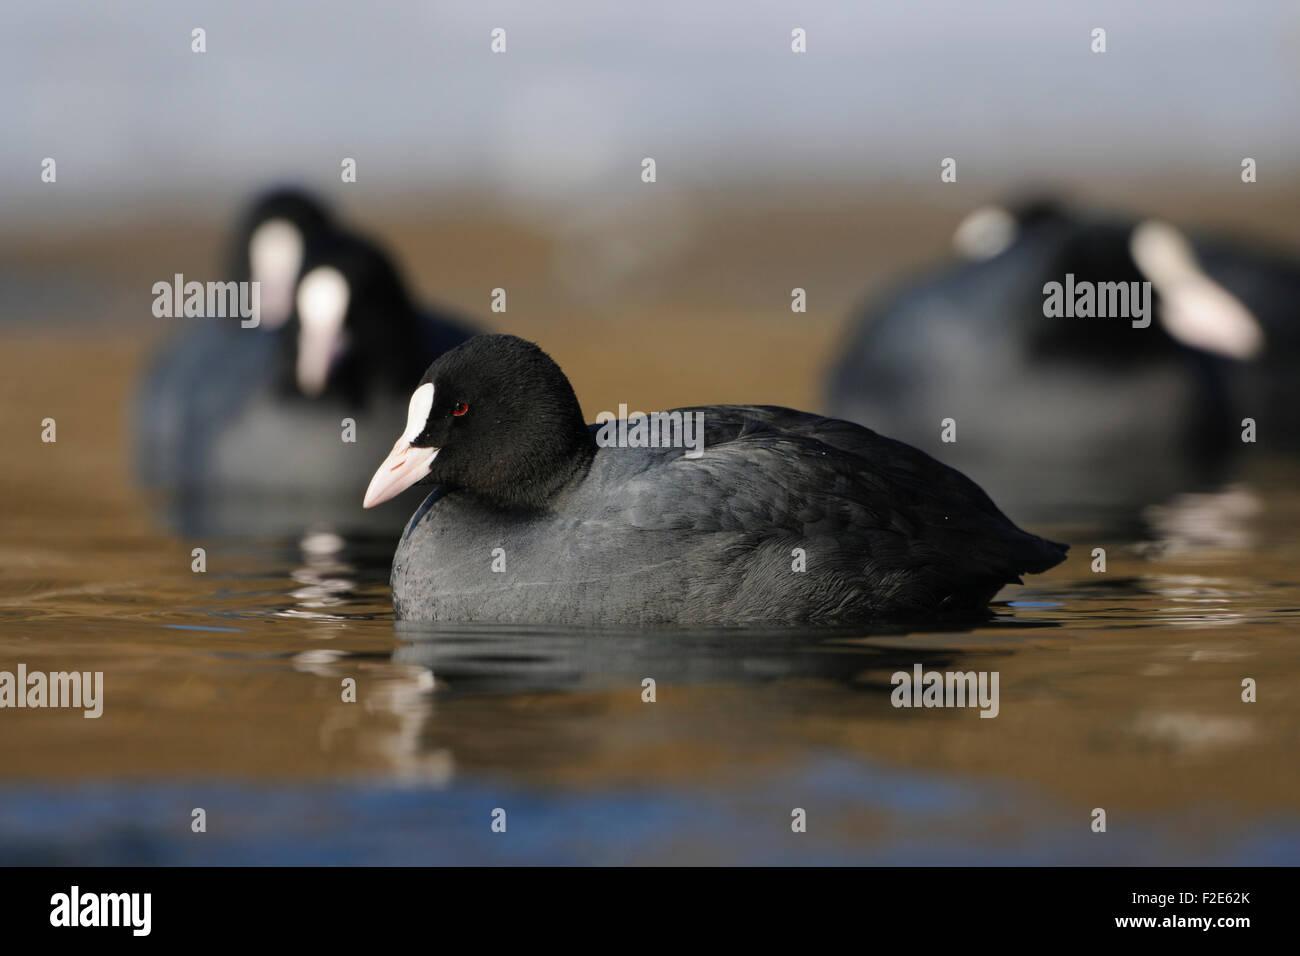 A flock of Fulica atra / Black Coot / Blaesshuhn / Blaessralle swimming on a frozen lake. - Stock Image